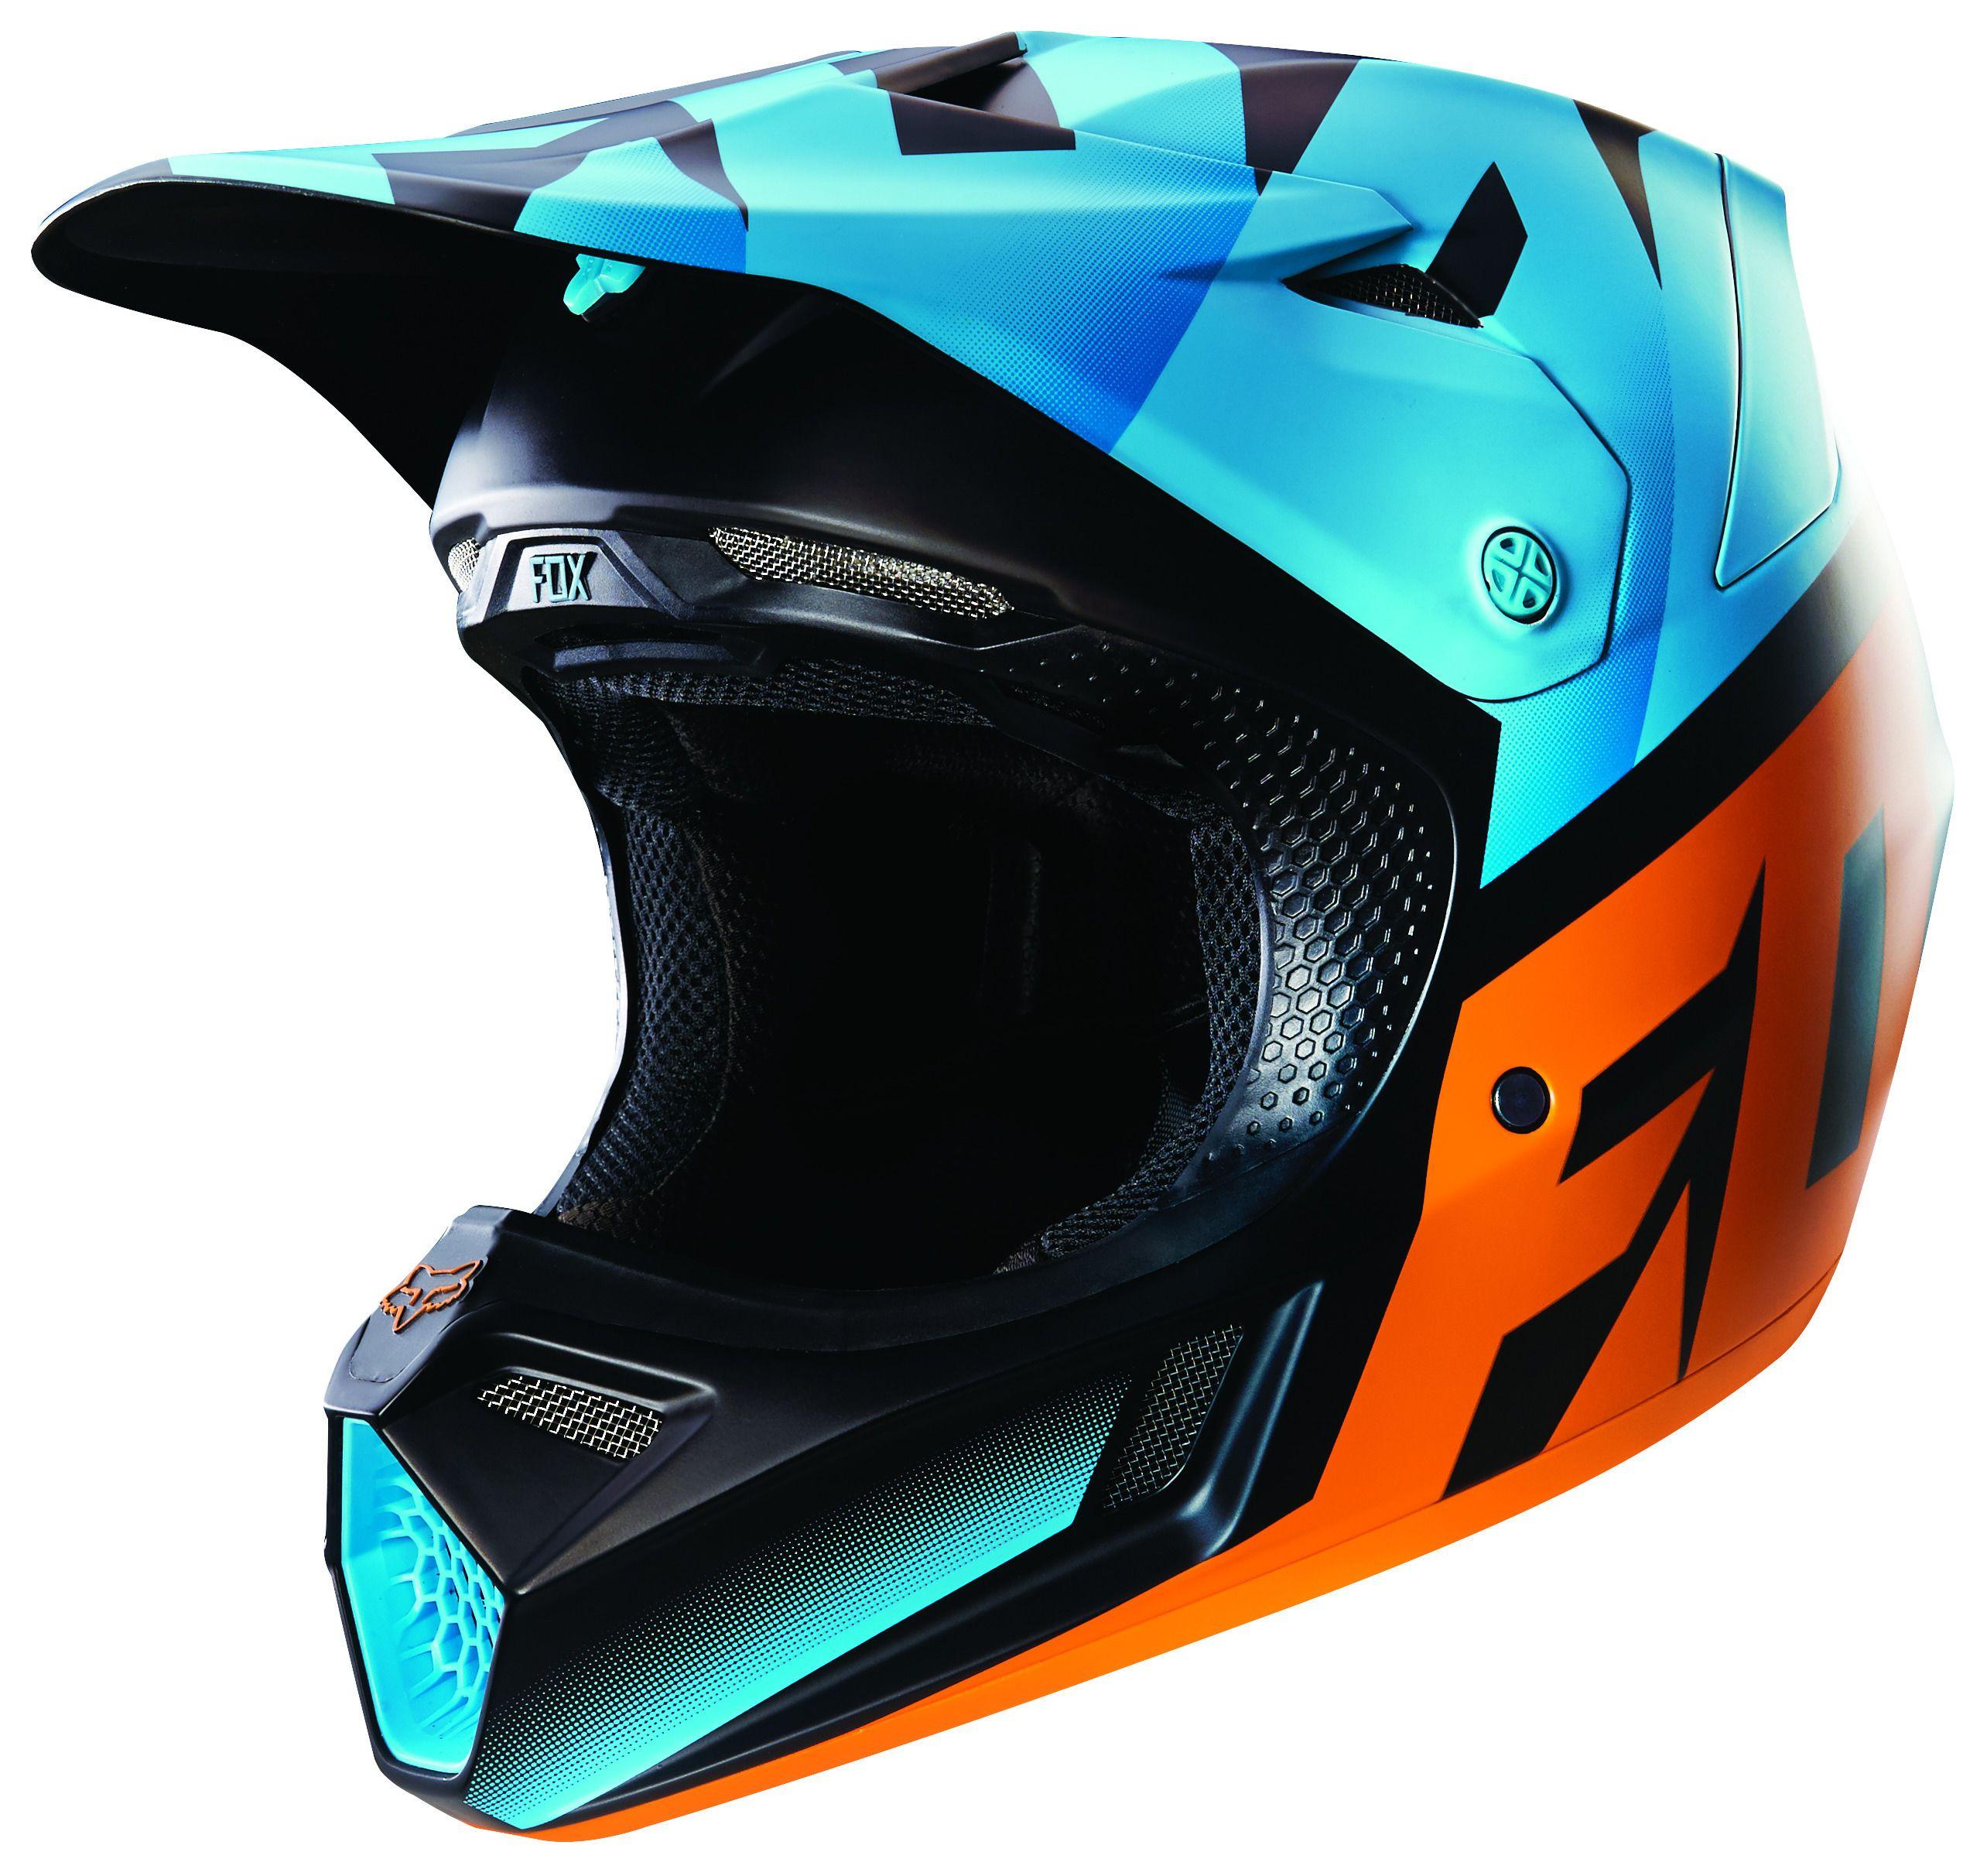 Fox Racing V3 Seca Le Helmet Cycle Gear